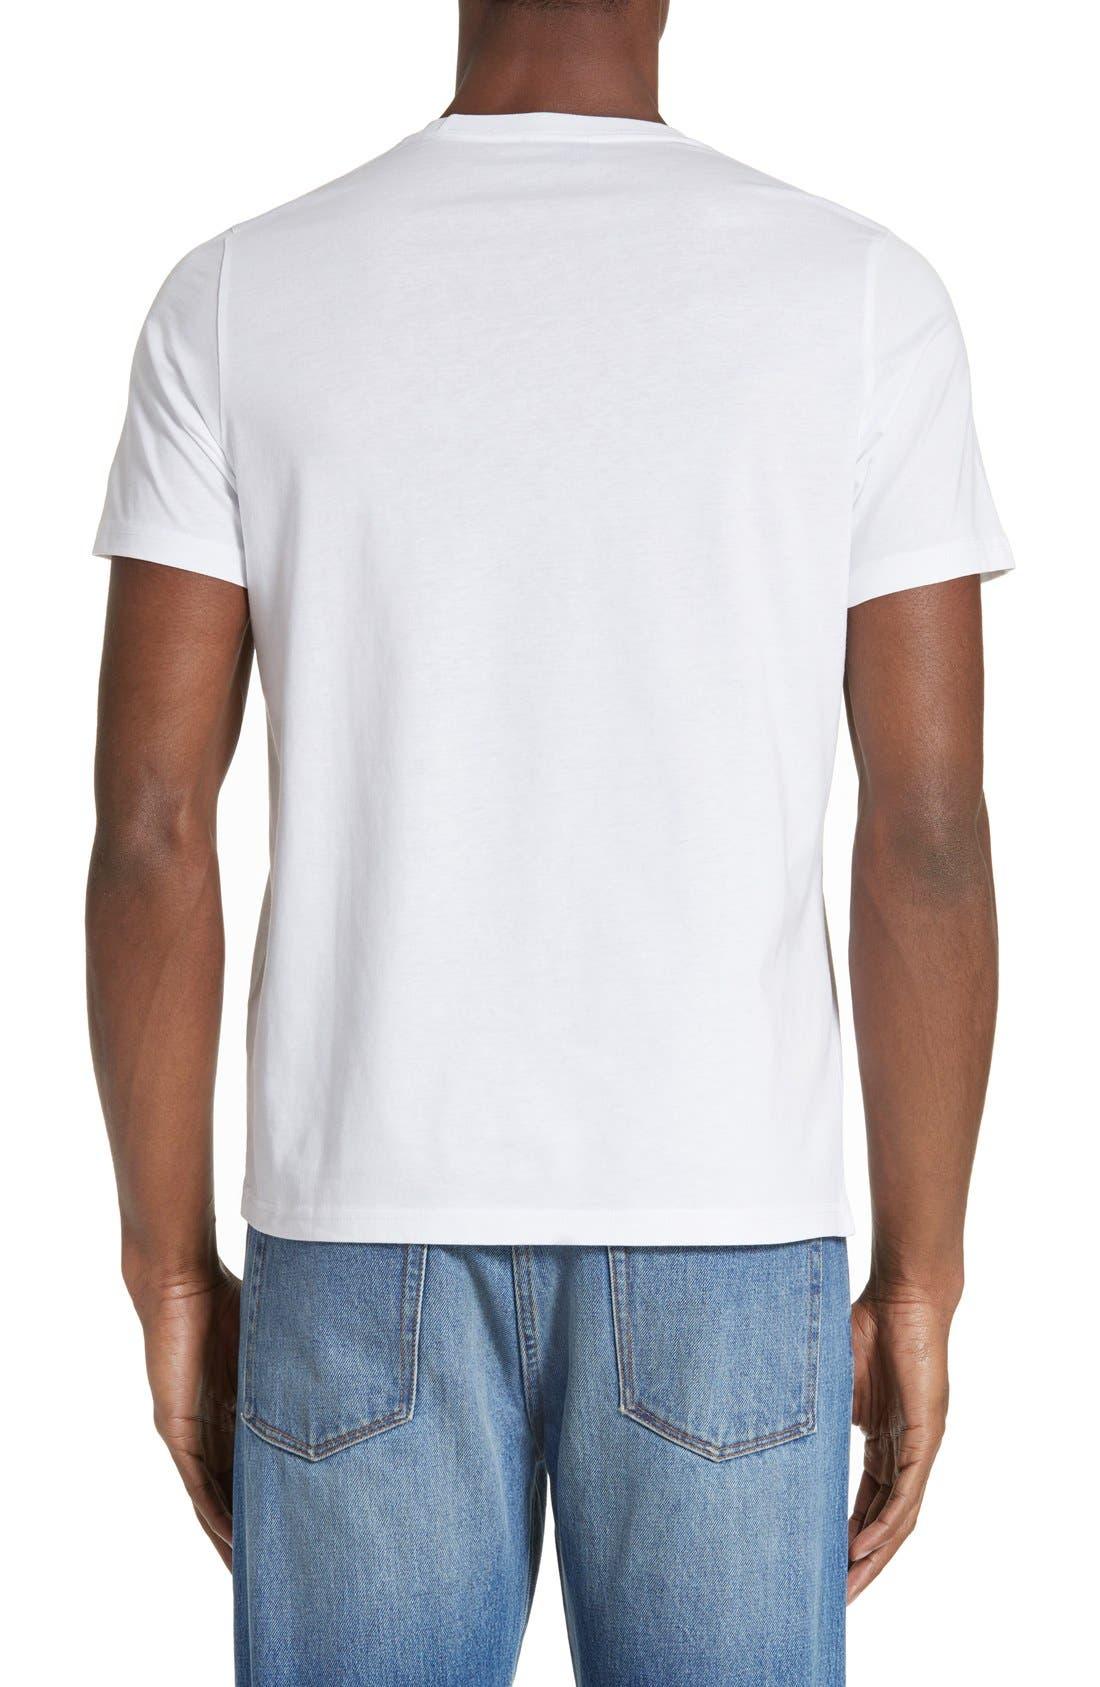 Palm Screen T-Shirt,                             Alternate thumbnail 2, color,                             White